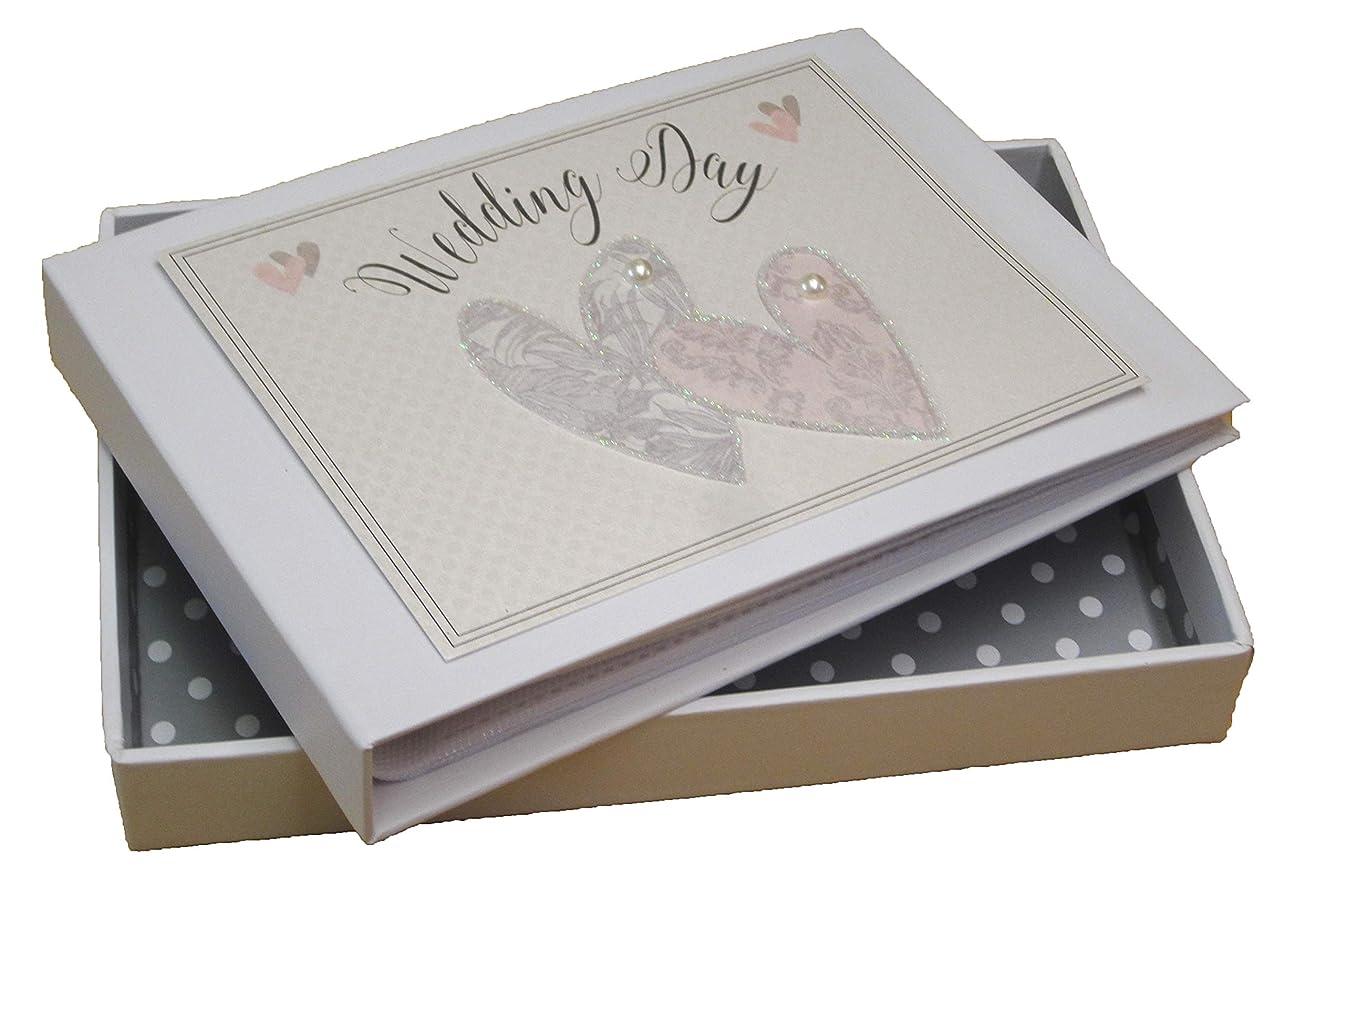 White Cotton Cards Wedding Day Love Hearts Mini Photo Album (NWH1T)